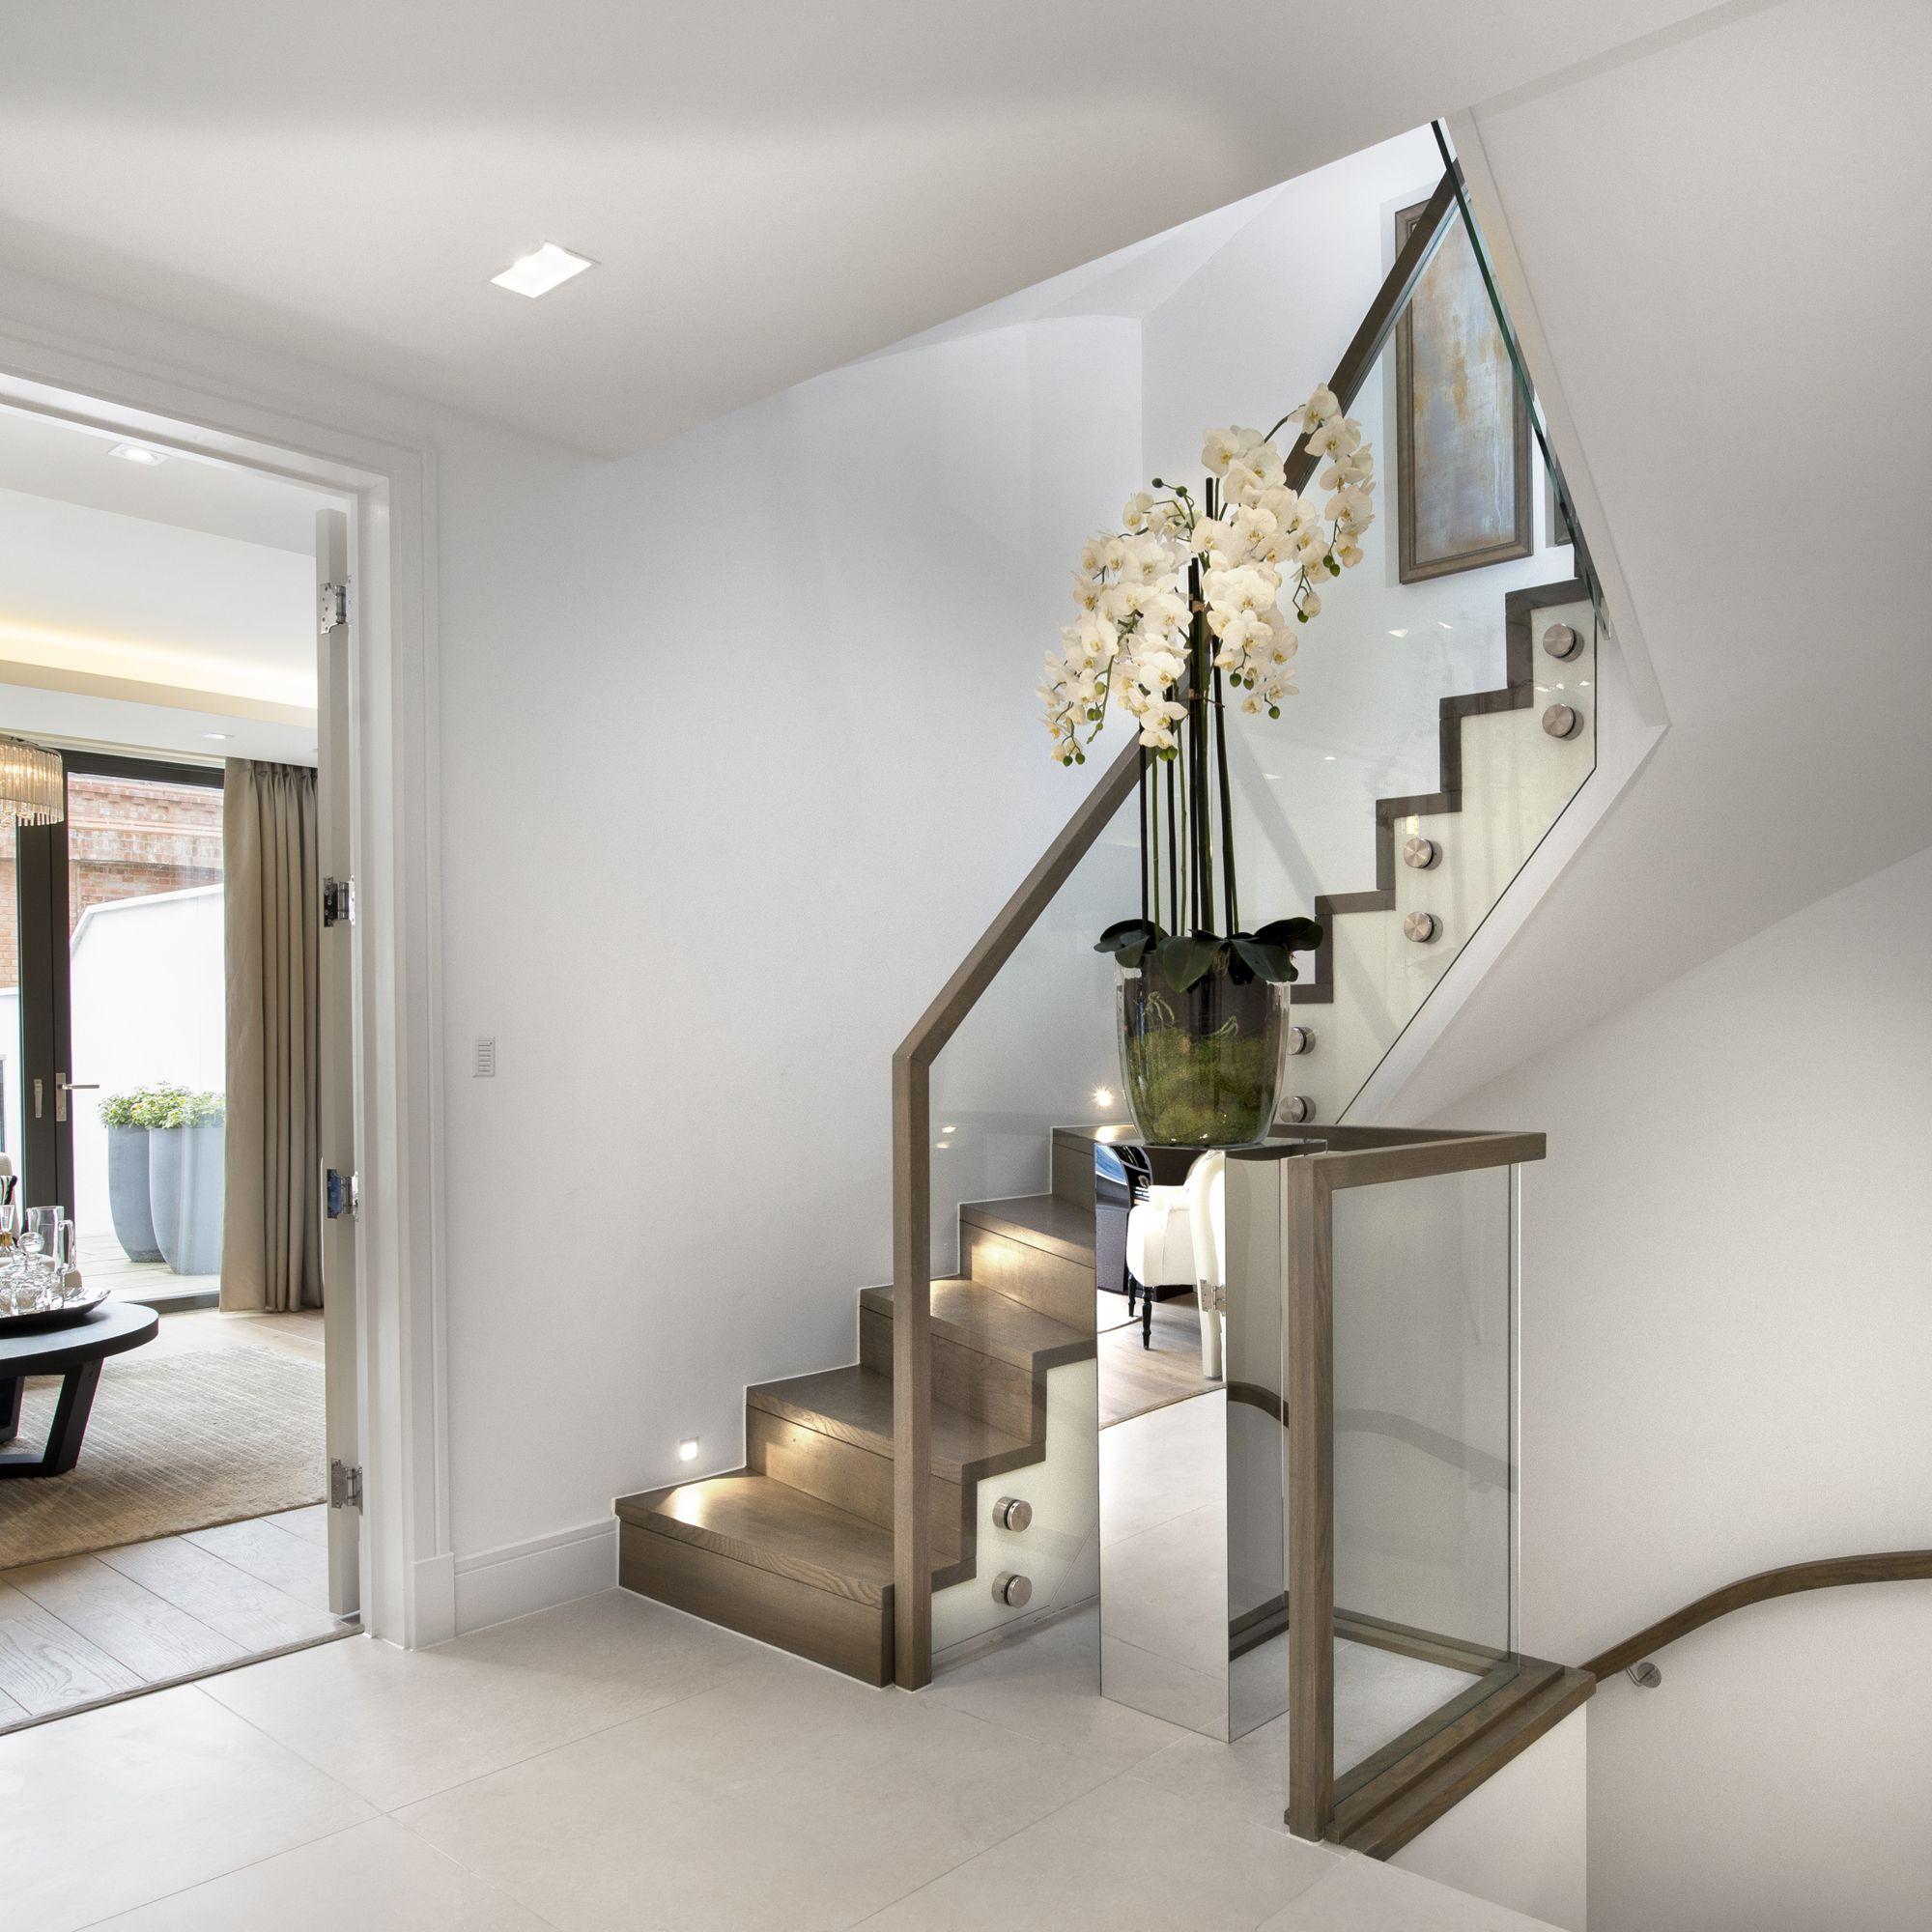 L trap trap maken trappen aan de beste prijs kwaliteit - Moderne designtrappen ...